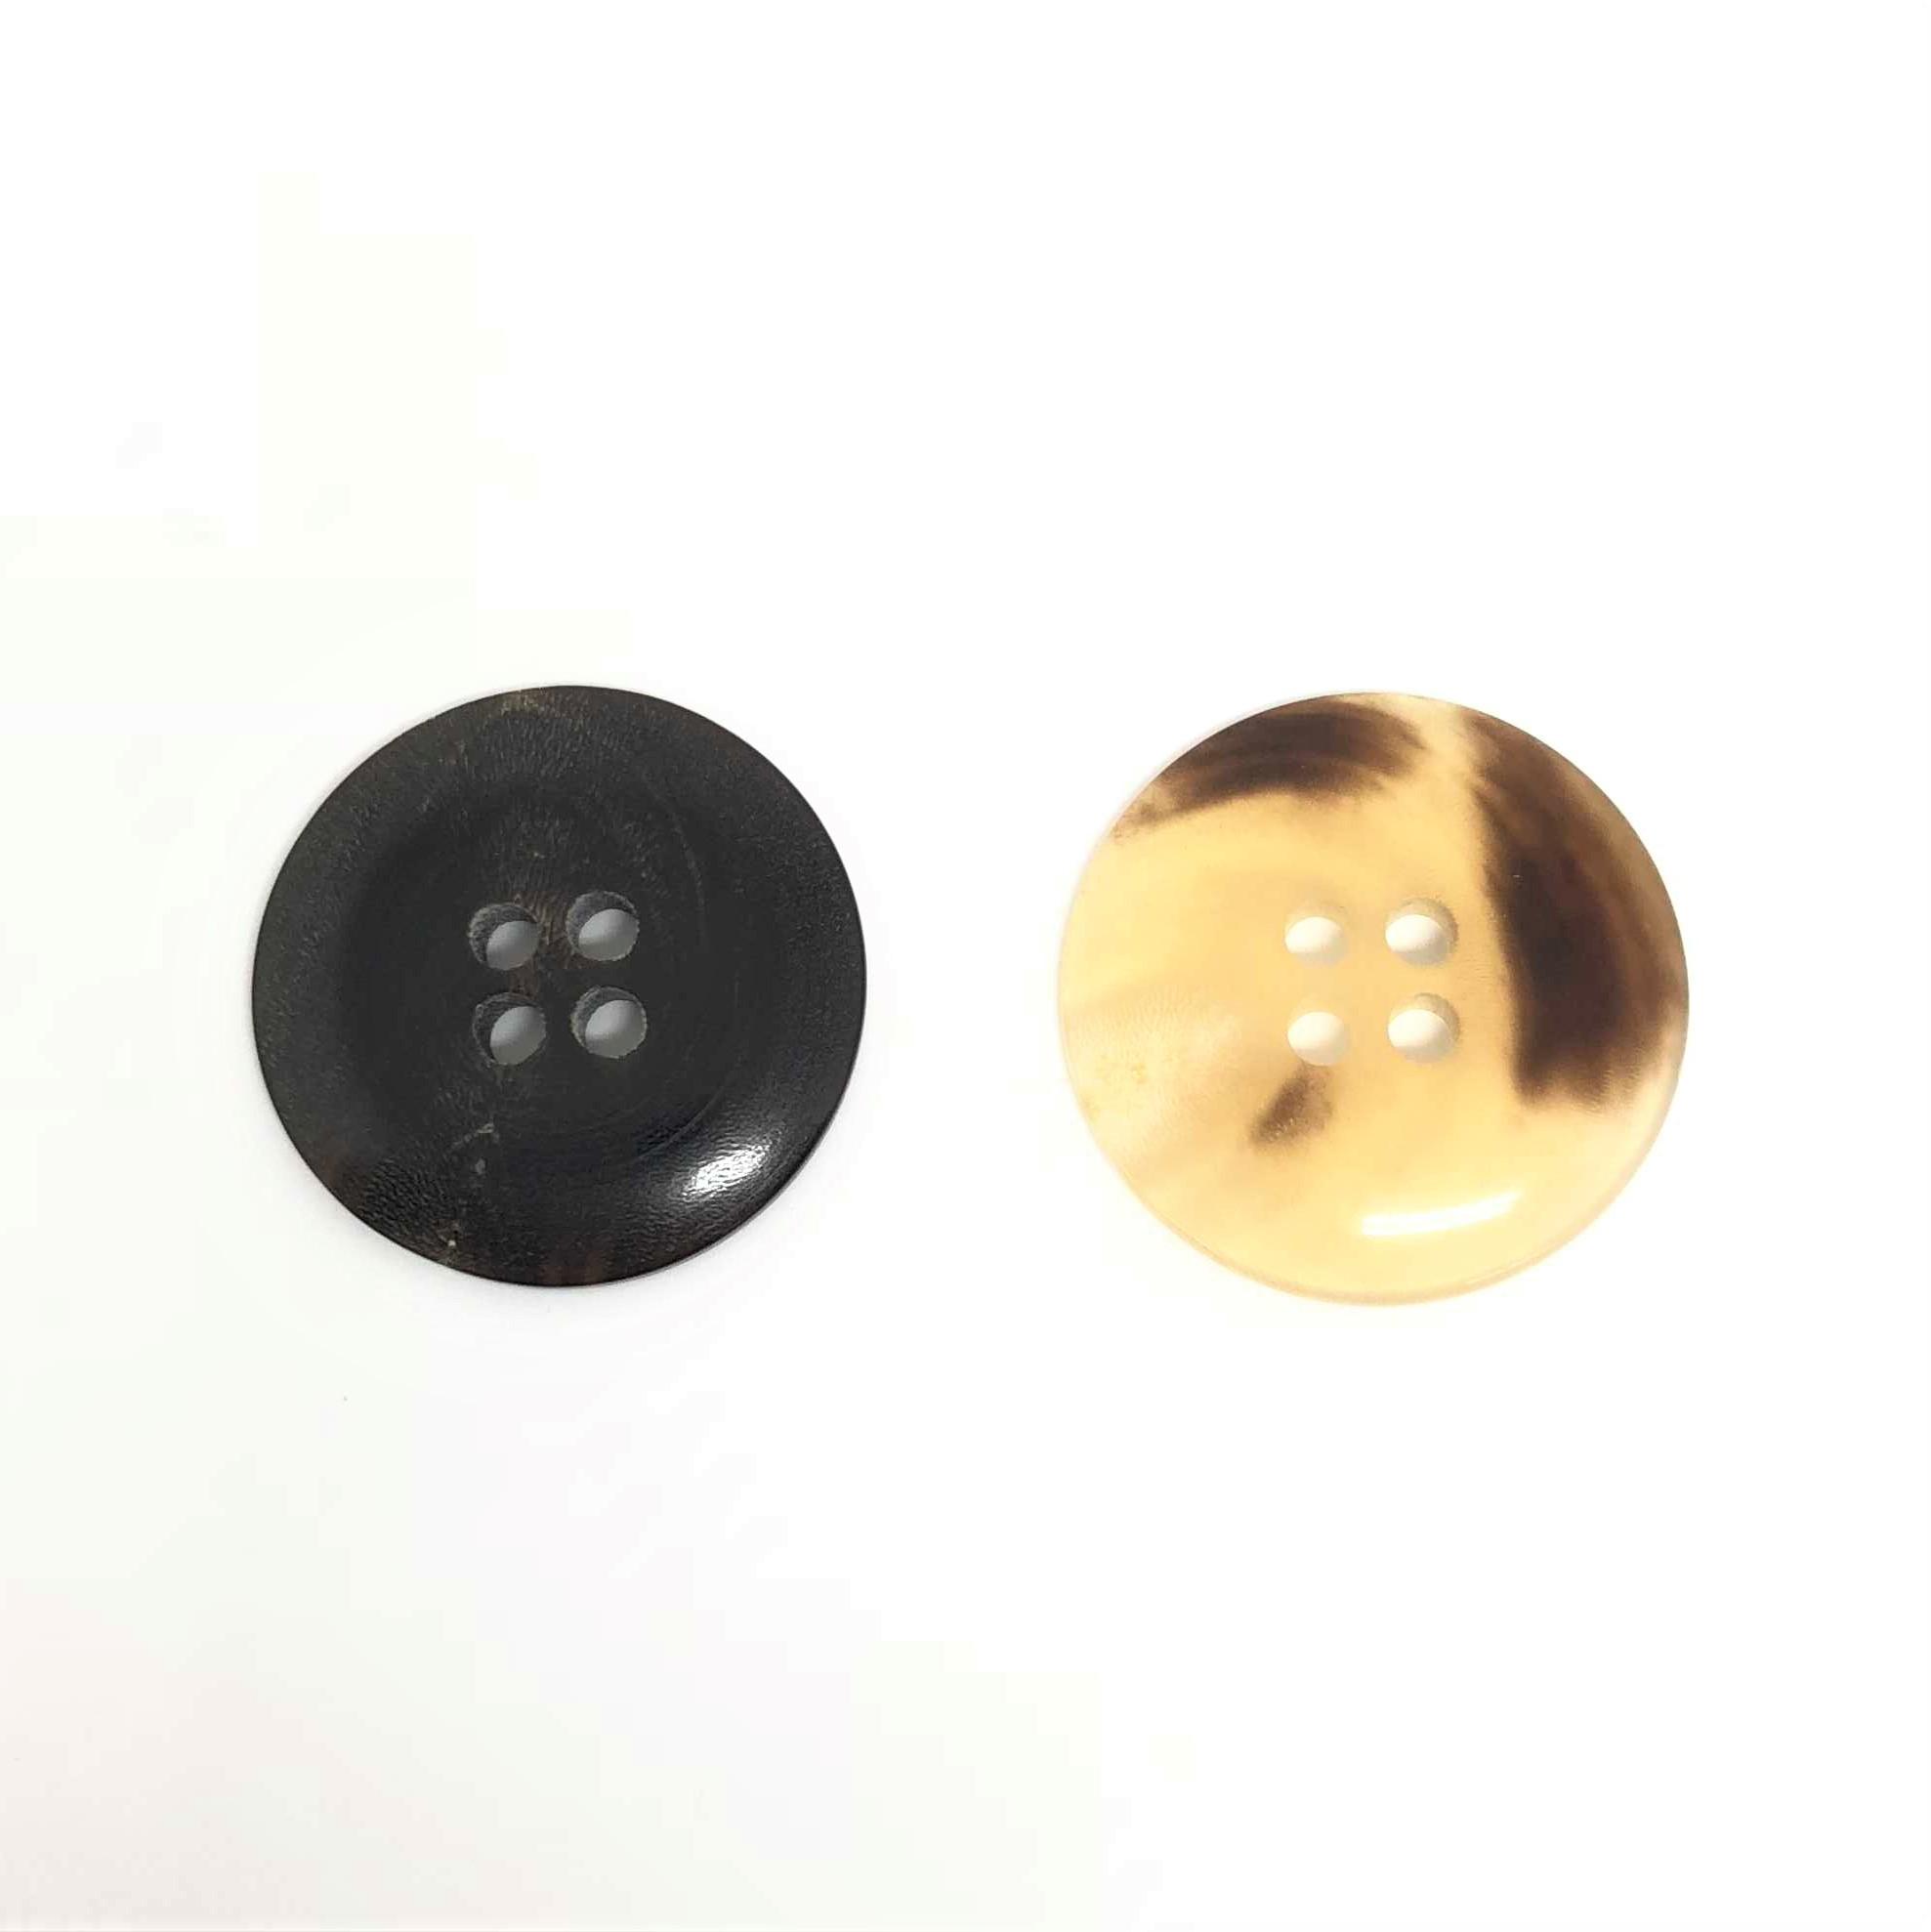 TGH1012 オリジナル水牛四つ穴ボタン オークラ商事 - ApparelX アパレル資材卸通販